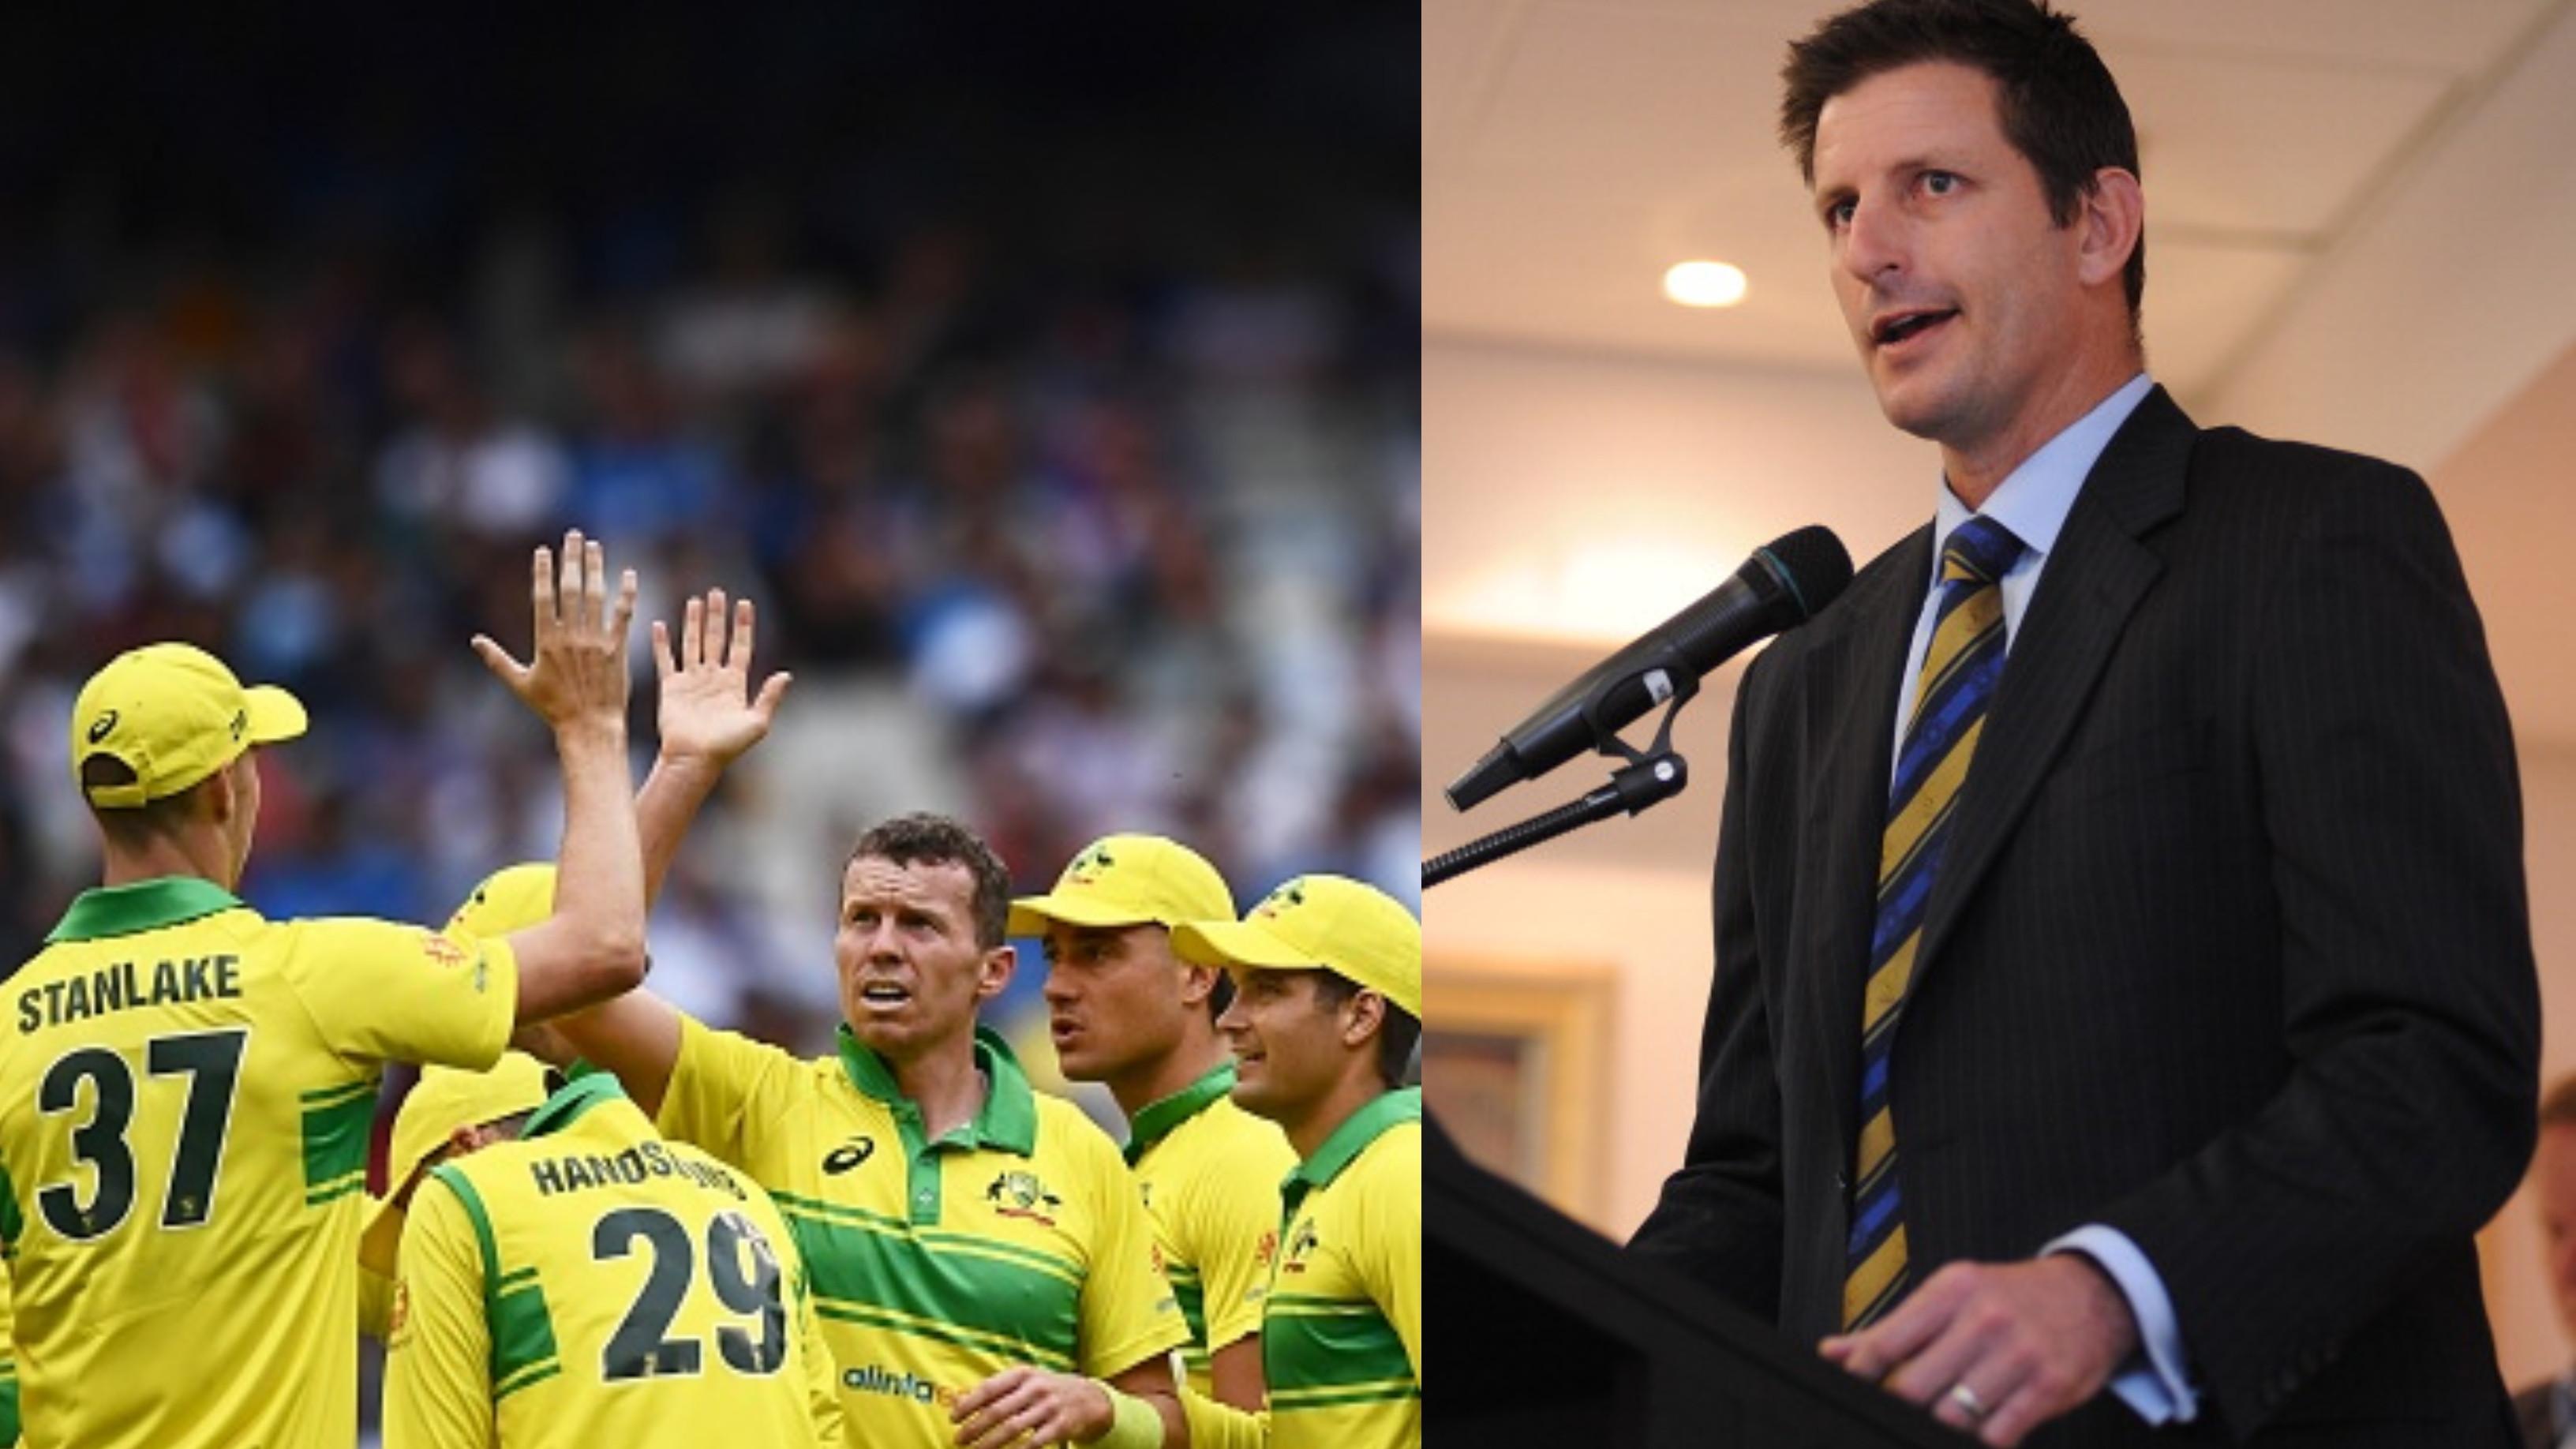 CWC 2019: Michael Kasprowicz speaks on Australia's 2019 World Cup chances